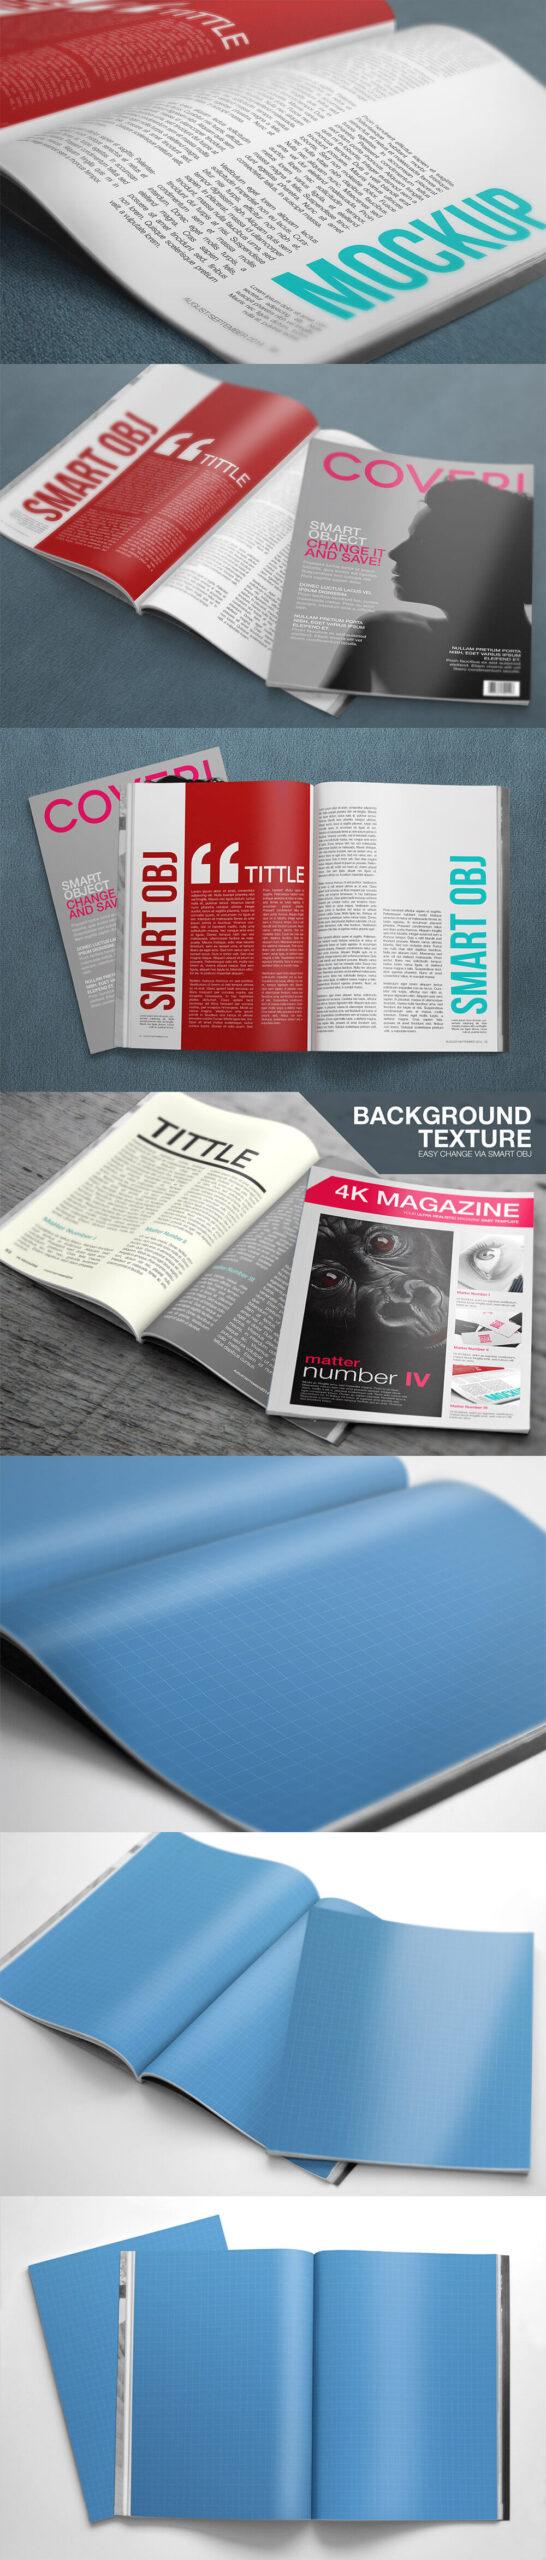 Free 4K Magazine Mockup PSD Template1 (1)